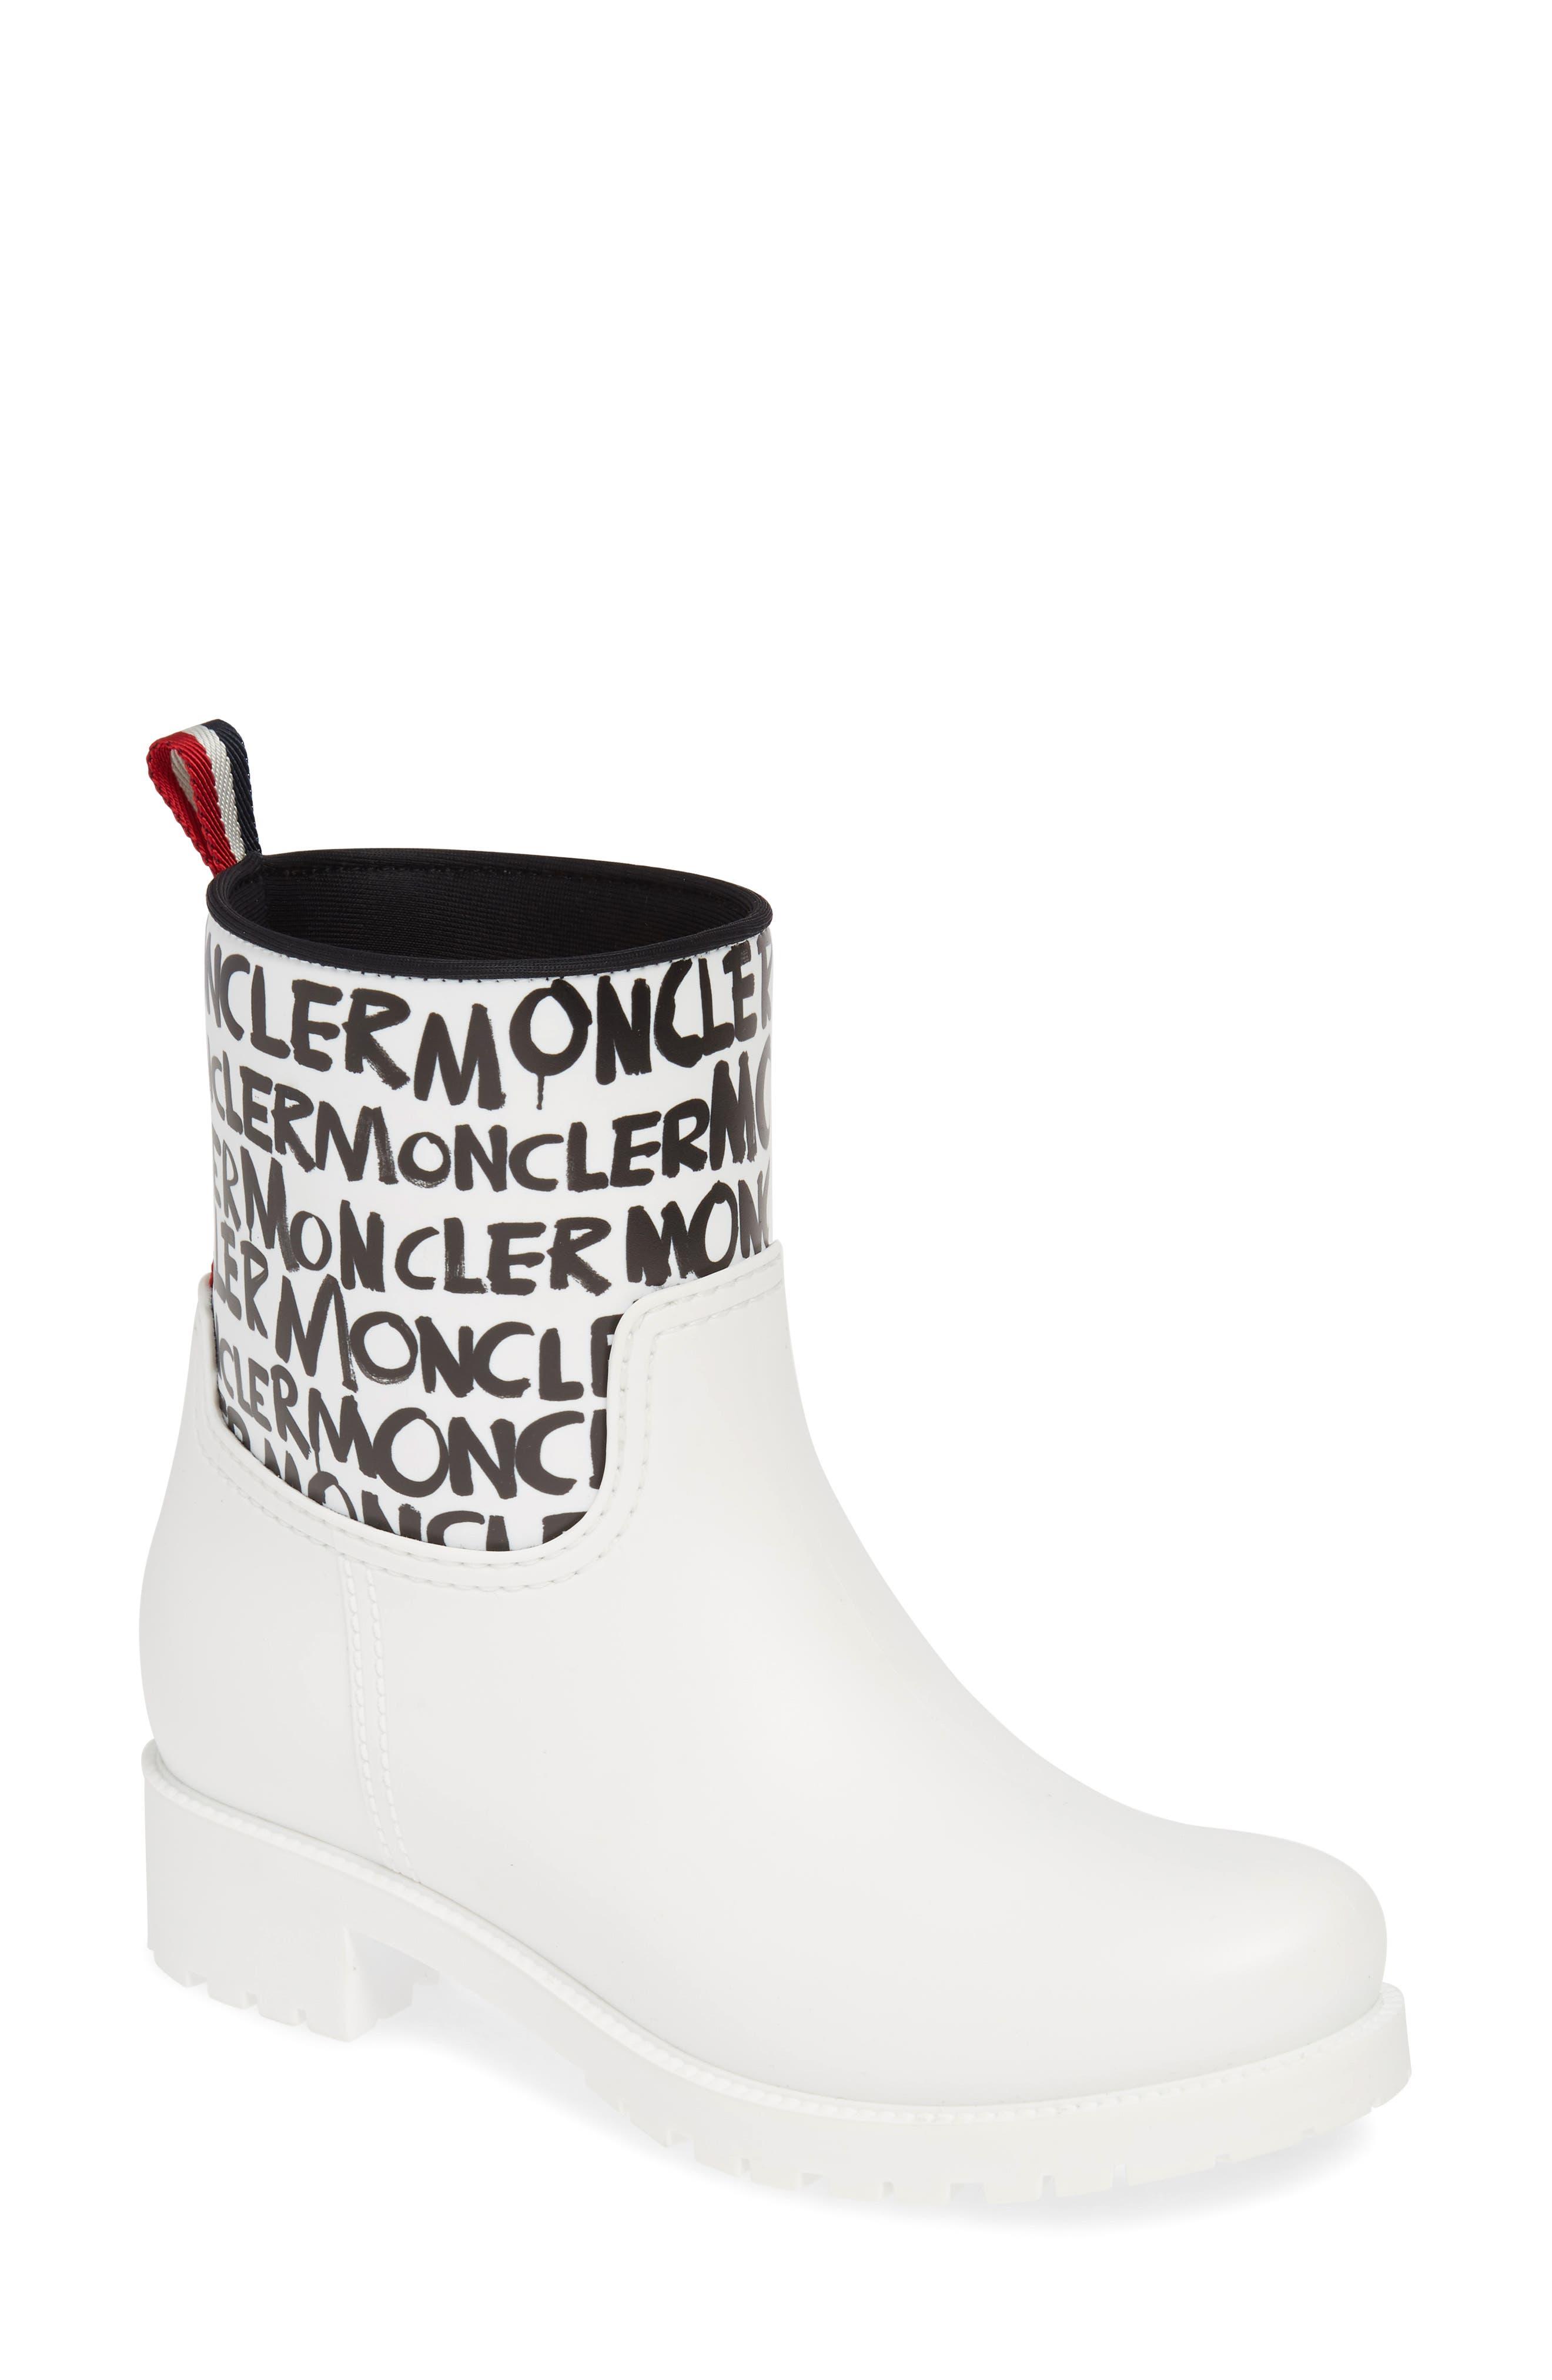 Moncler Ginette Stivale Logo Waterproof Rain Boot